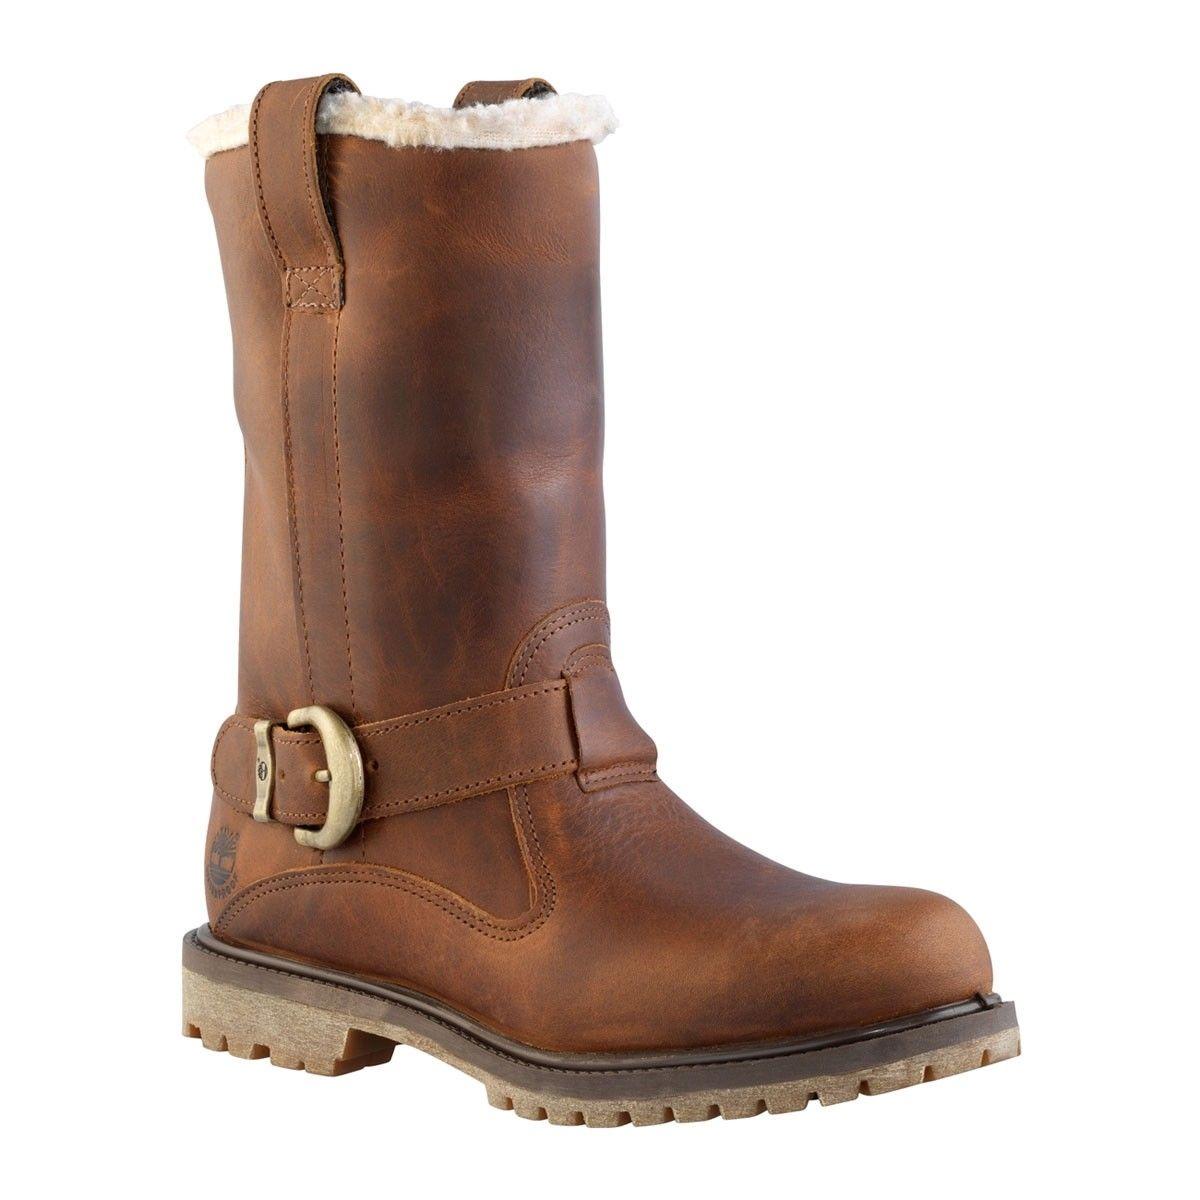 SCARPE TIMBERLAND N.39,5 UK6 Stivali Boots Leather EUR 25